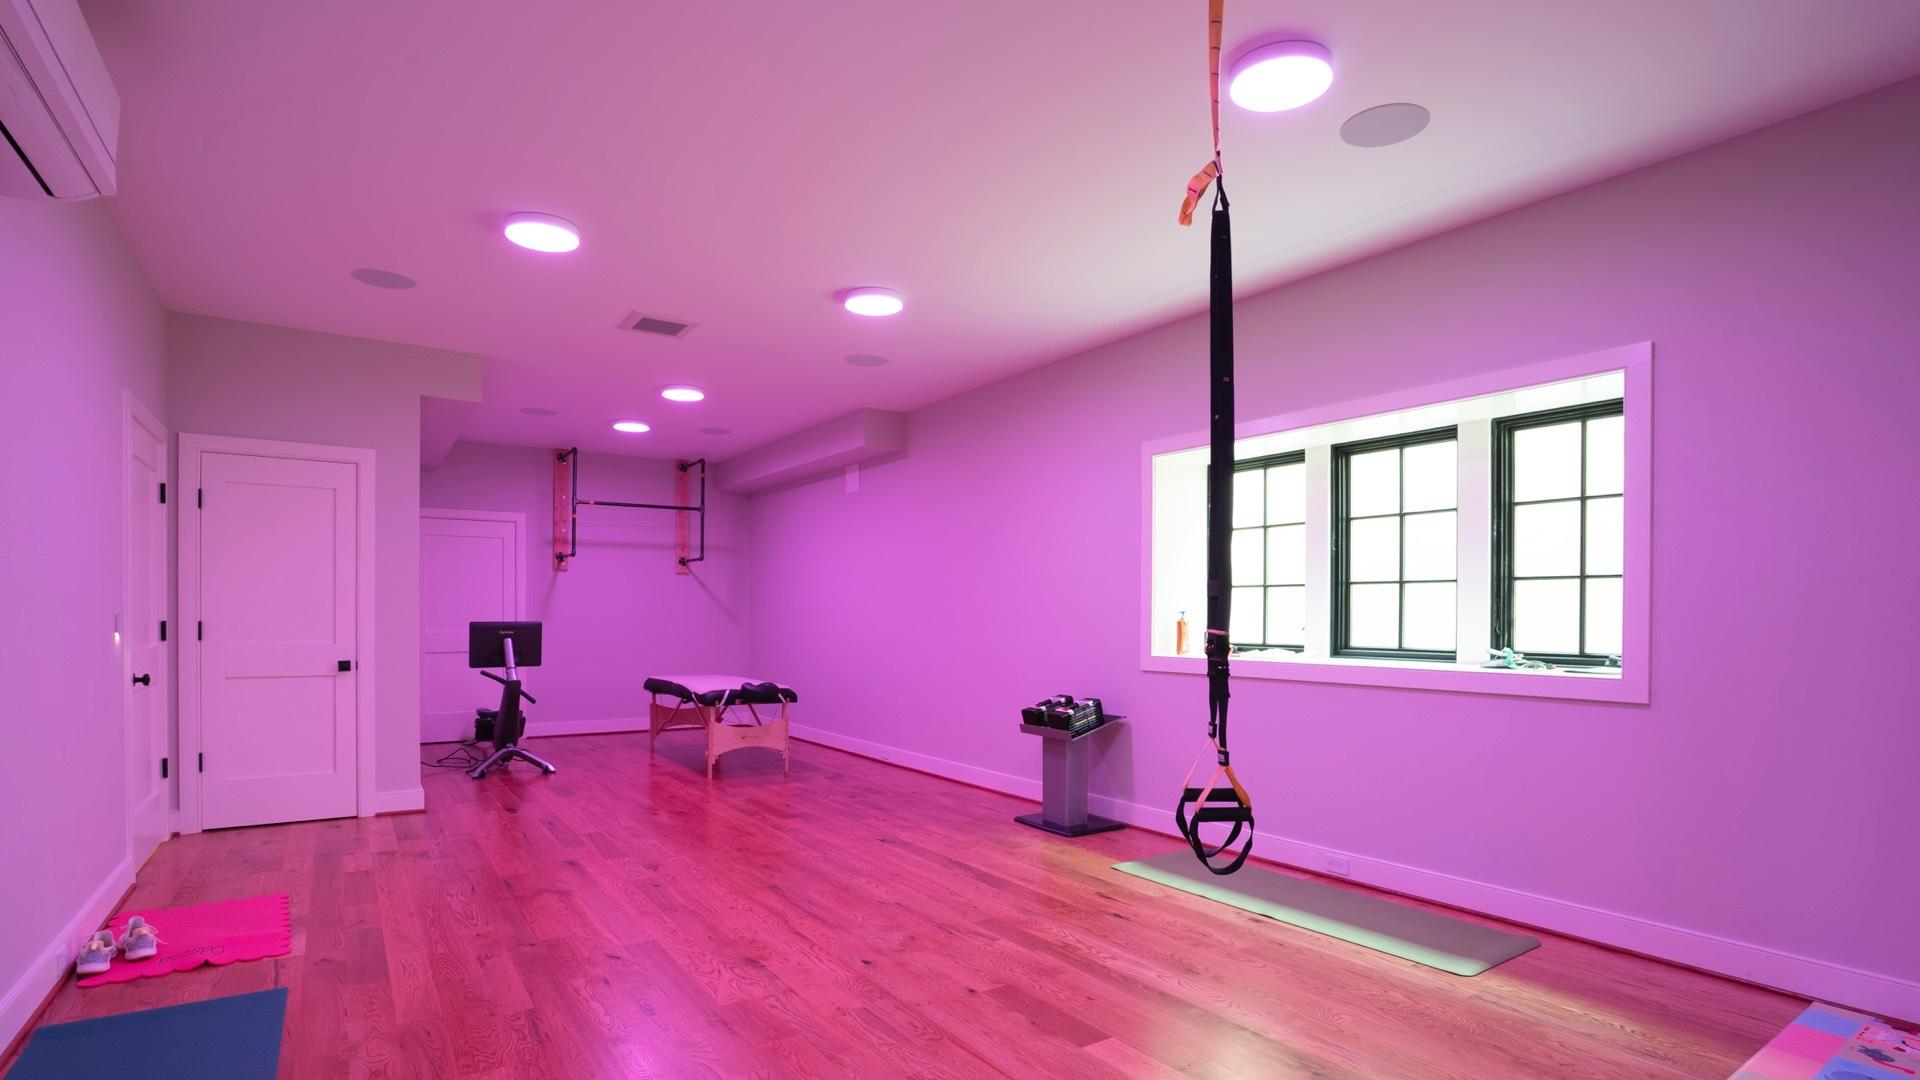 Celek Smart Home - Fitnessraum